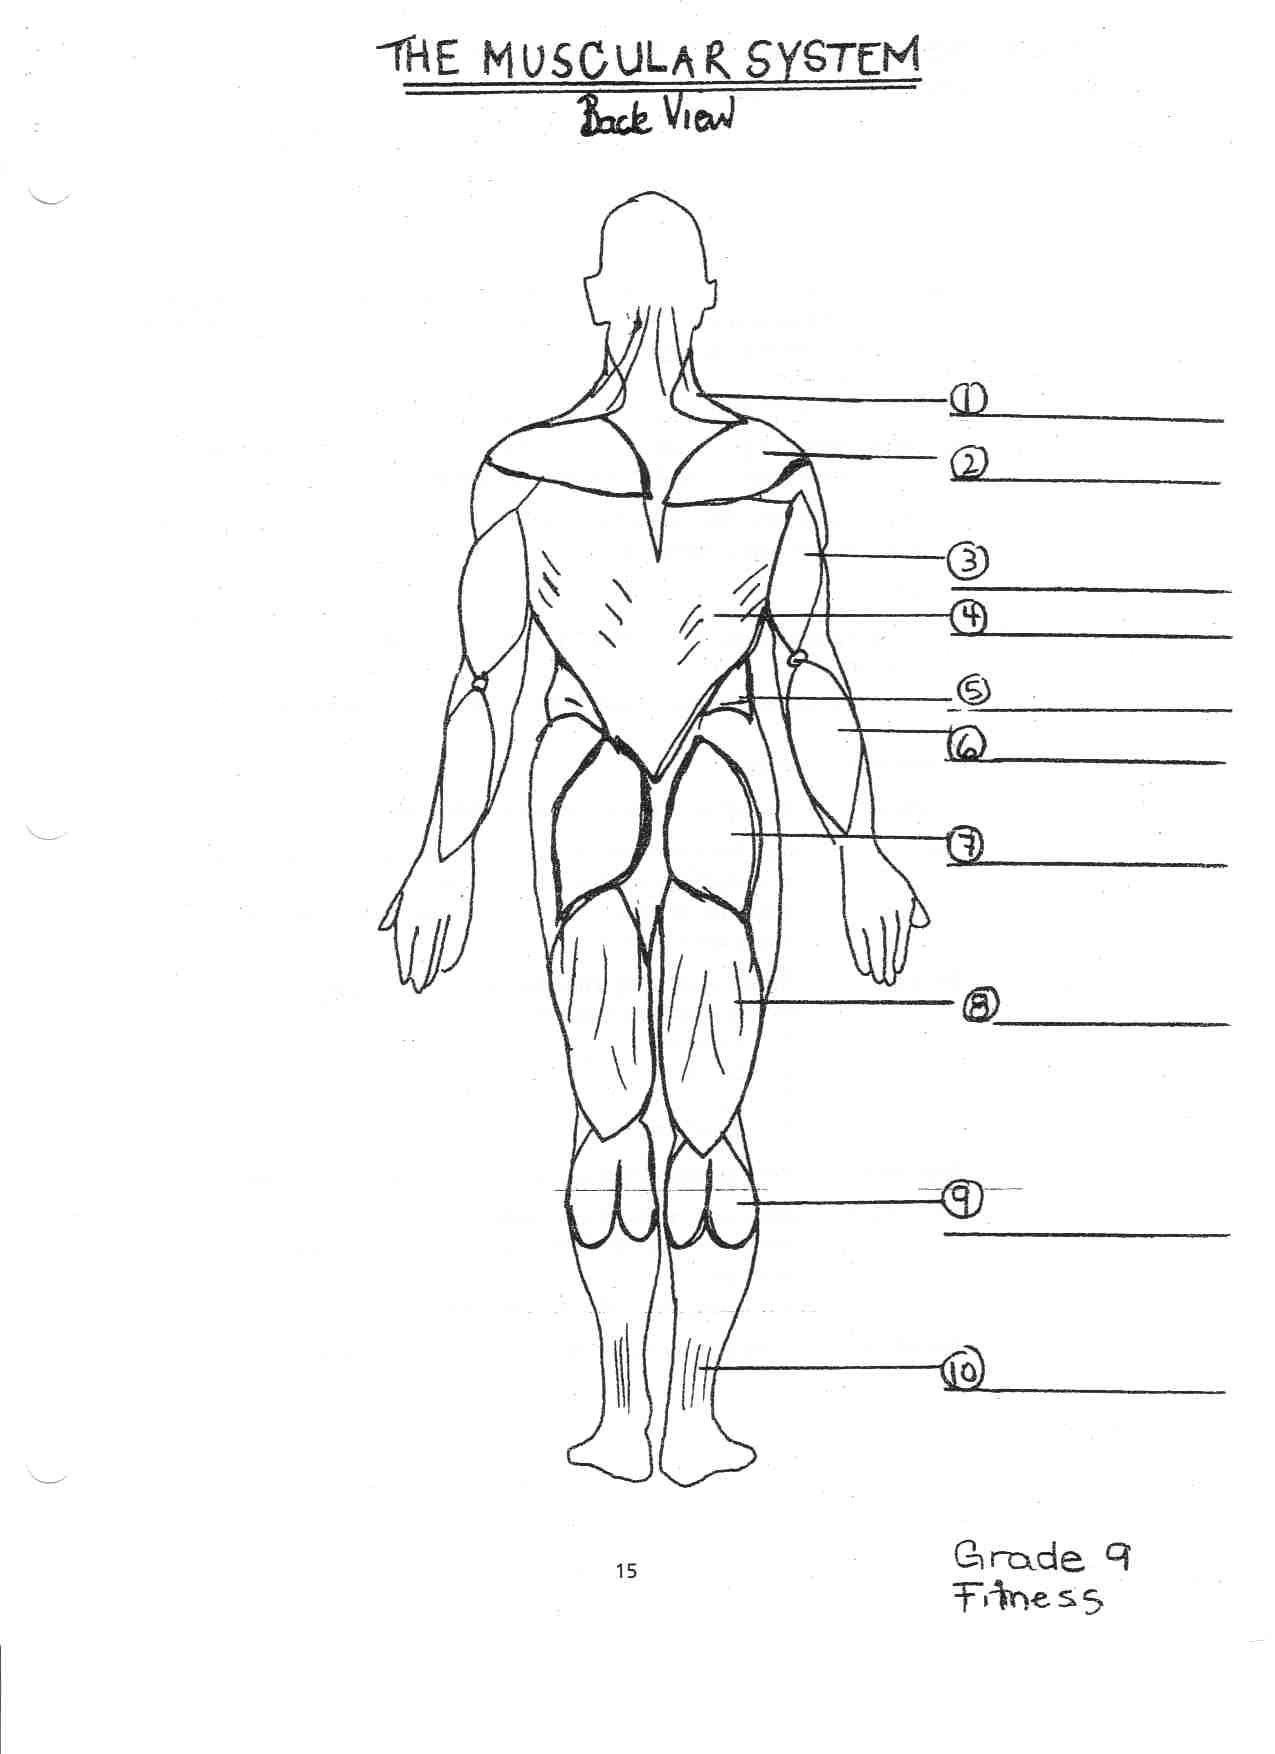 superior body diagram unlabeled wiring diagram img Diaphragm Diagram Unlabeled